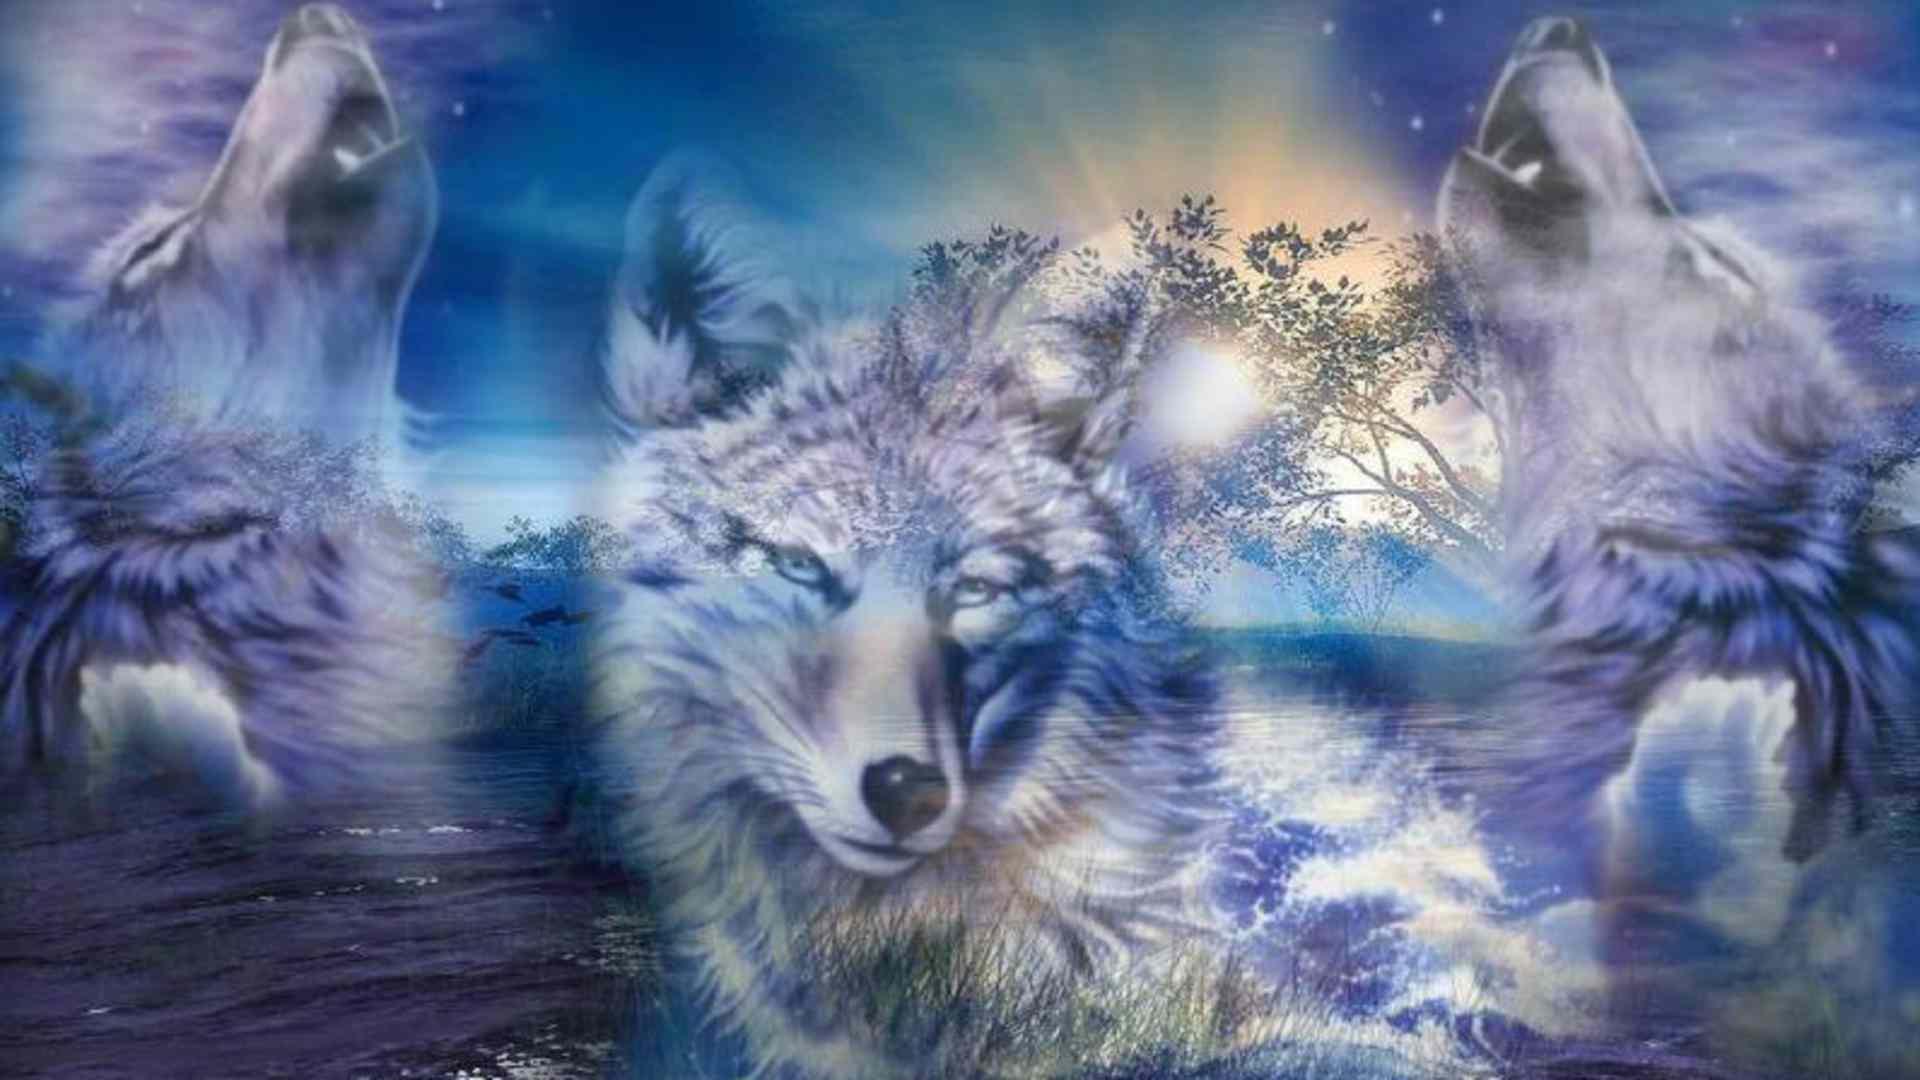 Best Wallpapers 3d Free Download Wolf Hd Desktop Wallpapers Pixelstalk Net